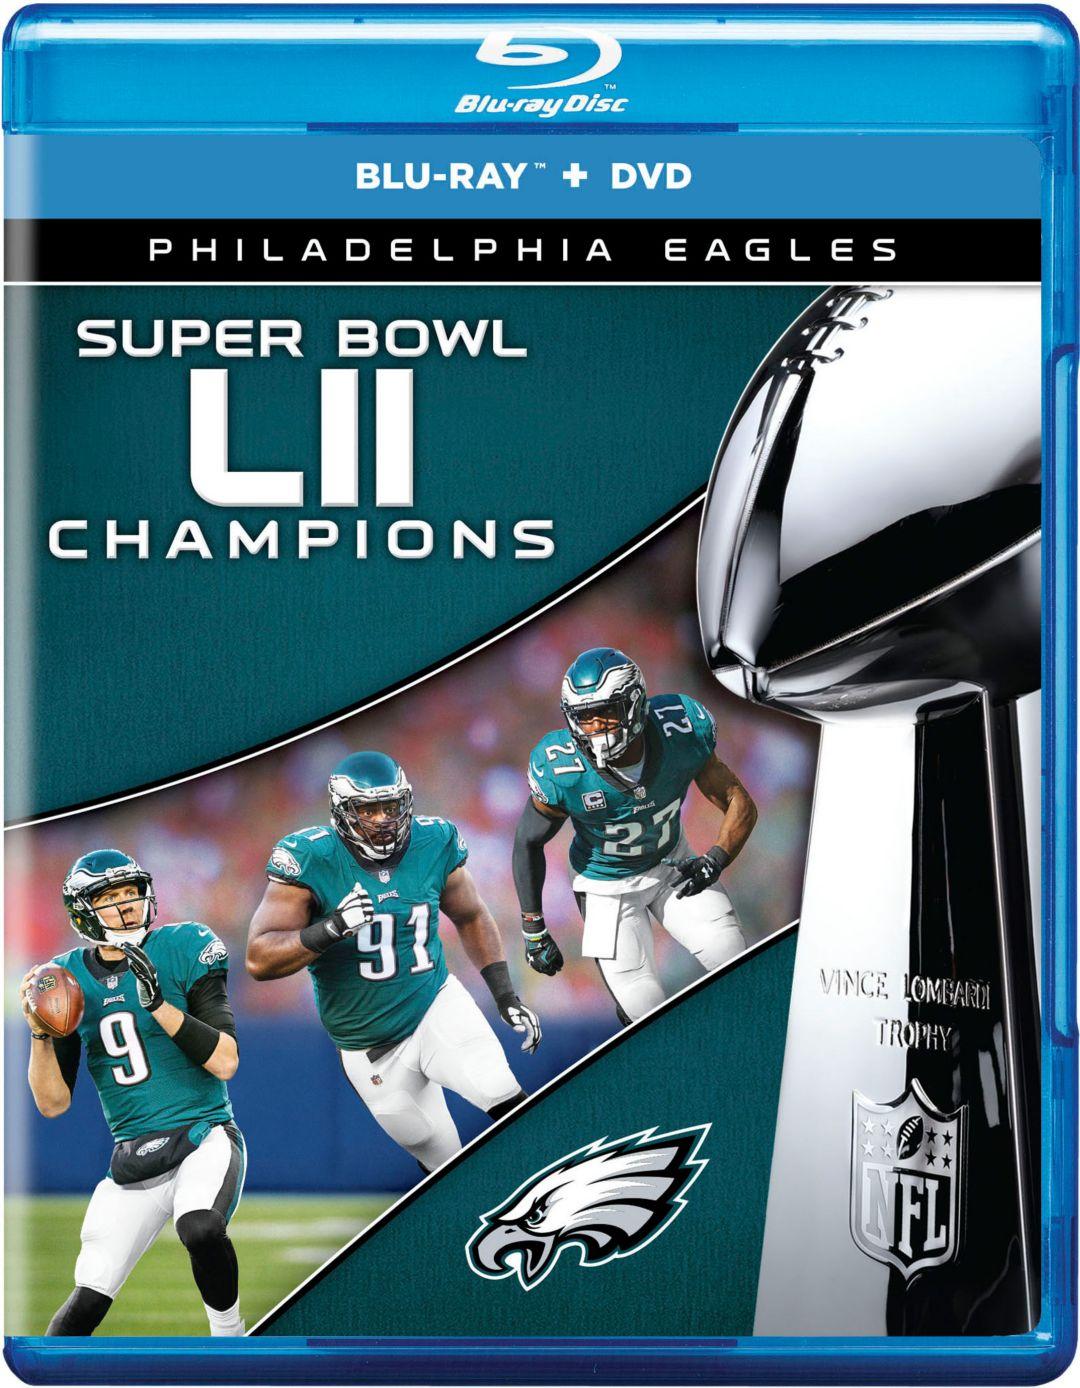 aa8582e7 Super Bowl LII Champions Philadelphia Eagles DVD & Blu-Ray Combo.  noImageFound. 1